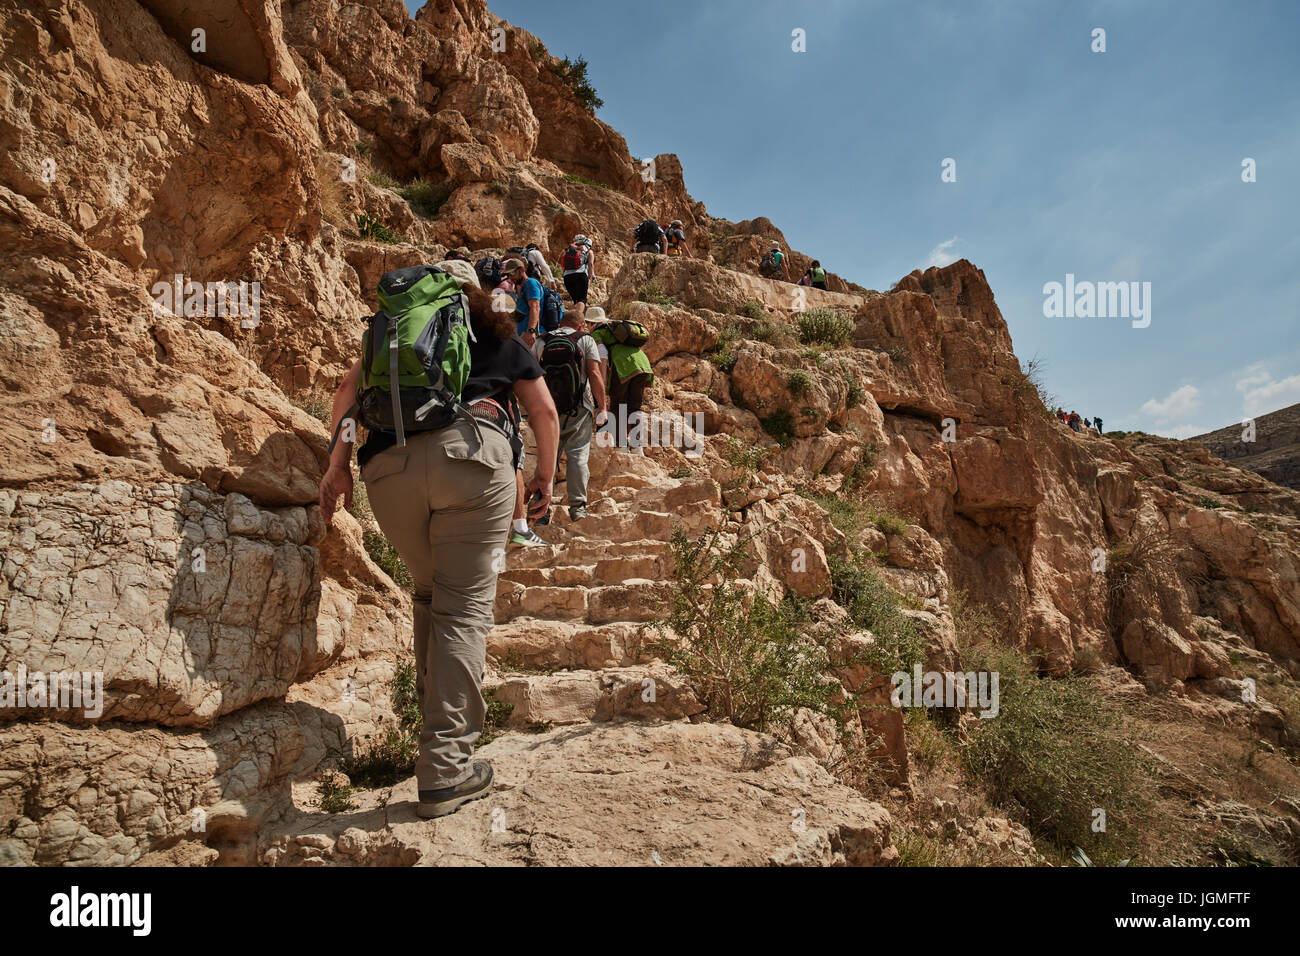 Mar Saba monastery at the desert (Israel) - Stock Image